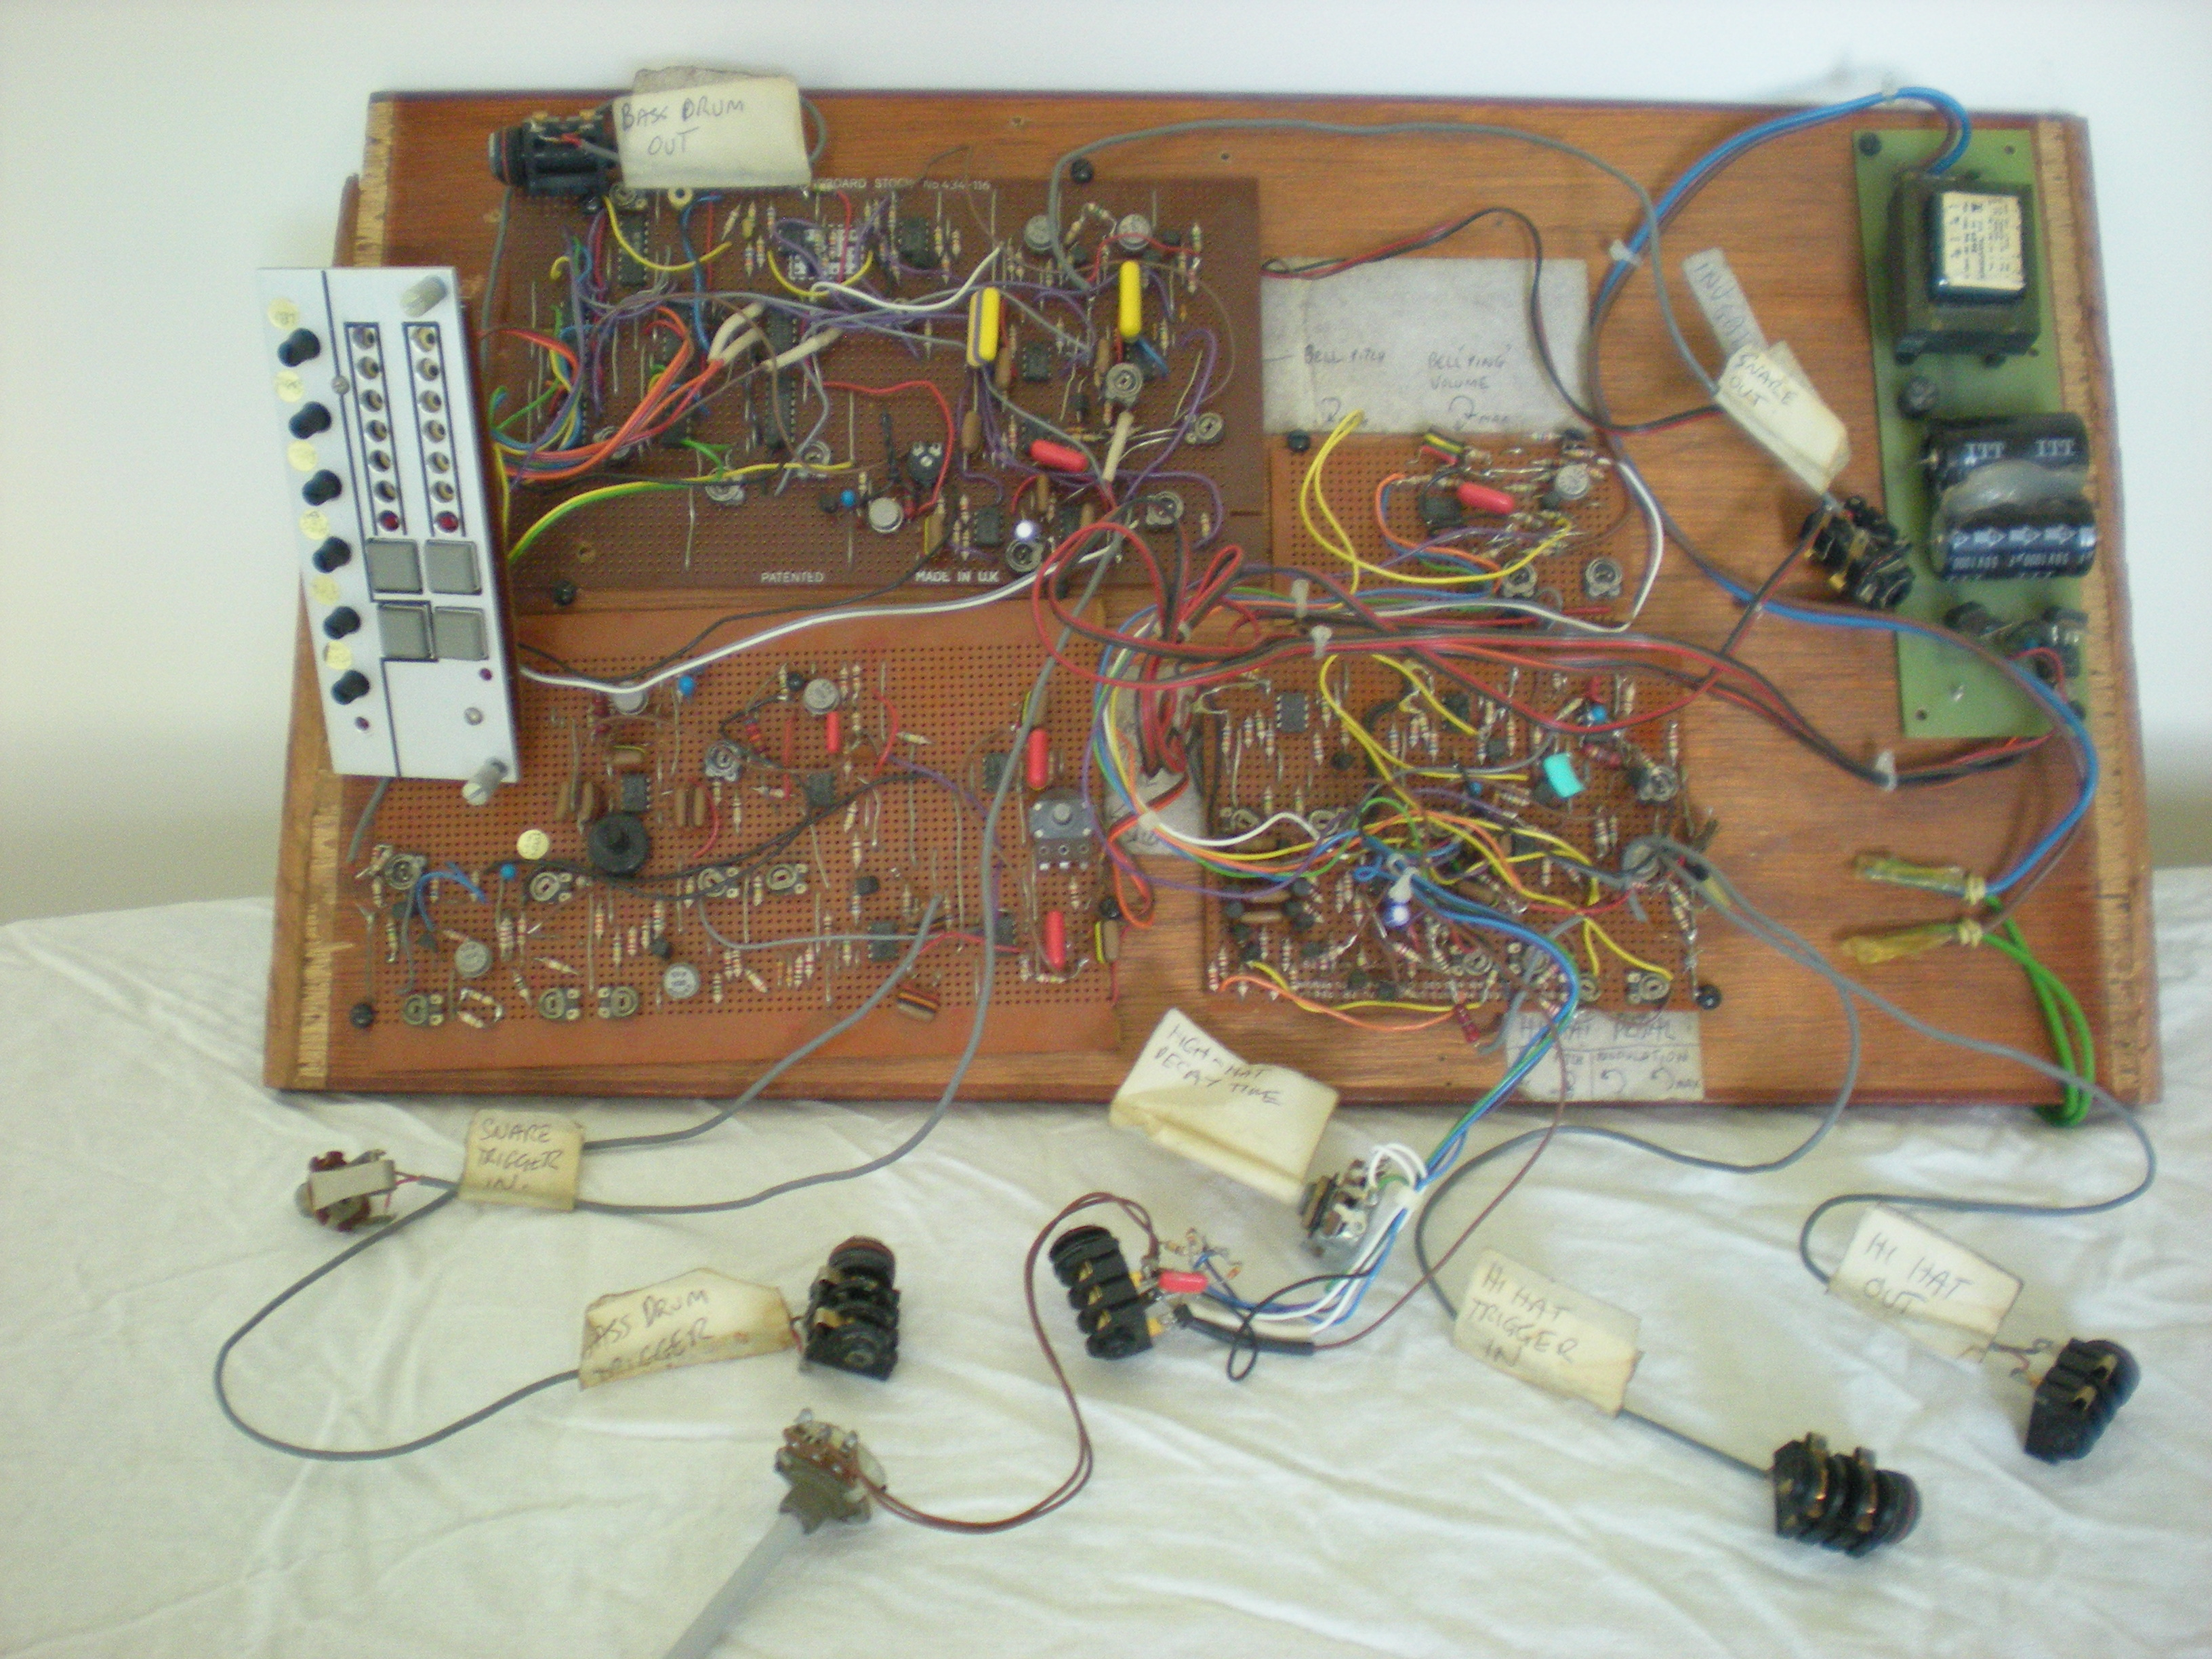 The SDSV prototype circuit board. Photo courtesy Burgess.